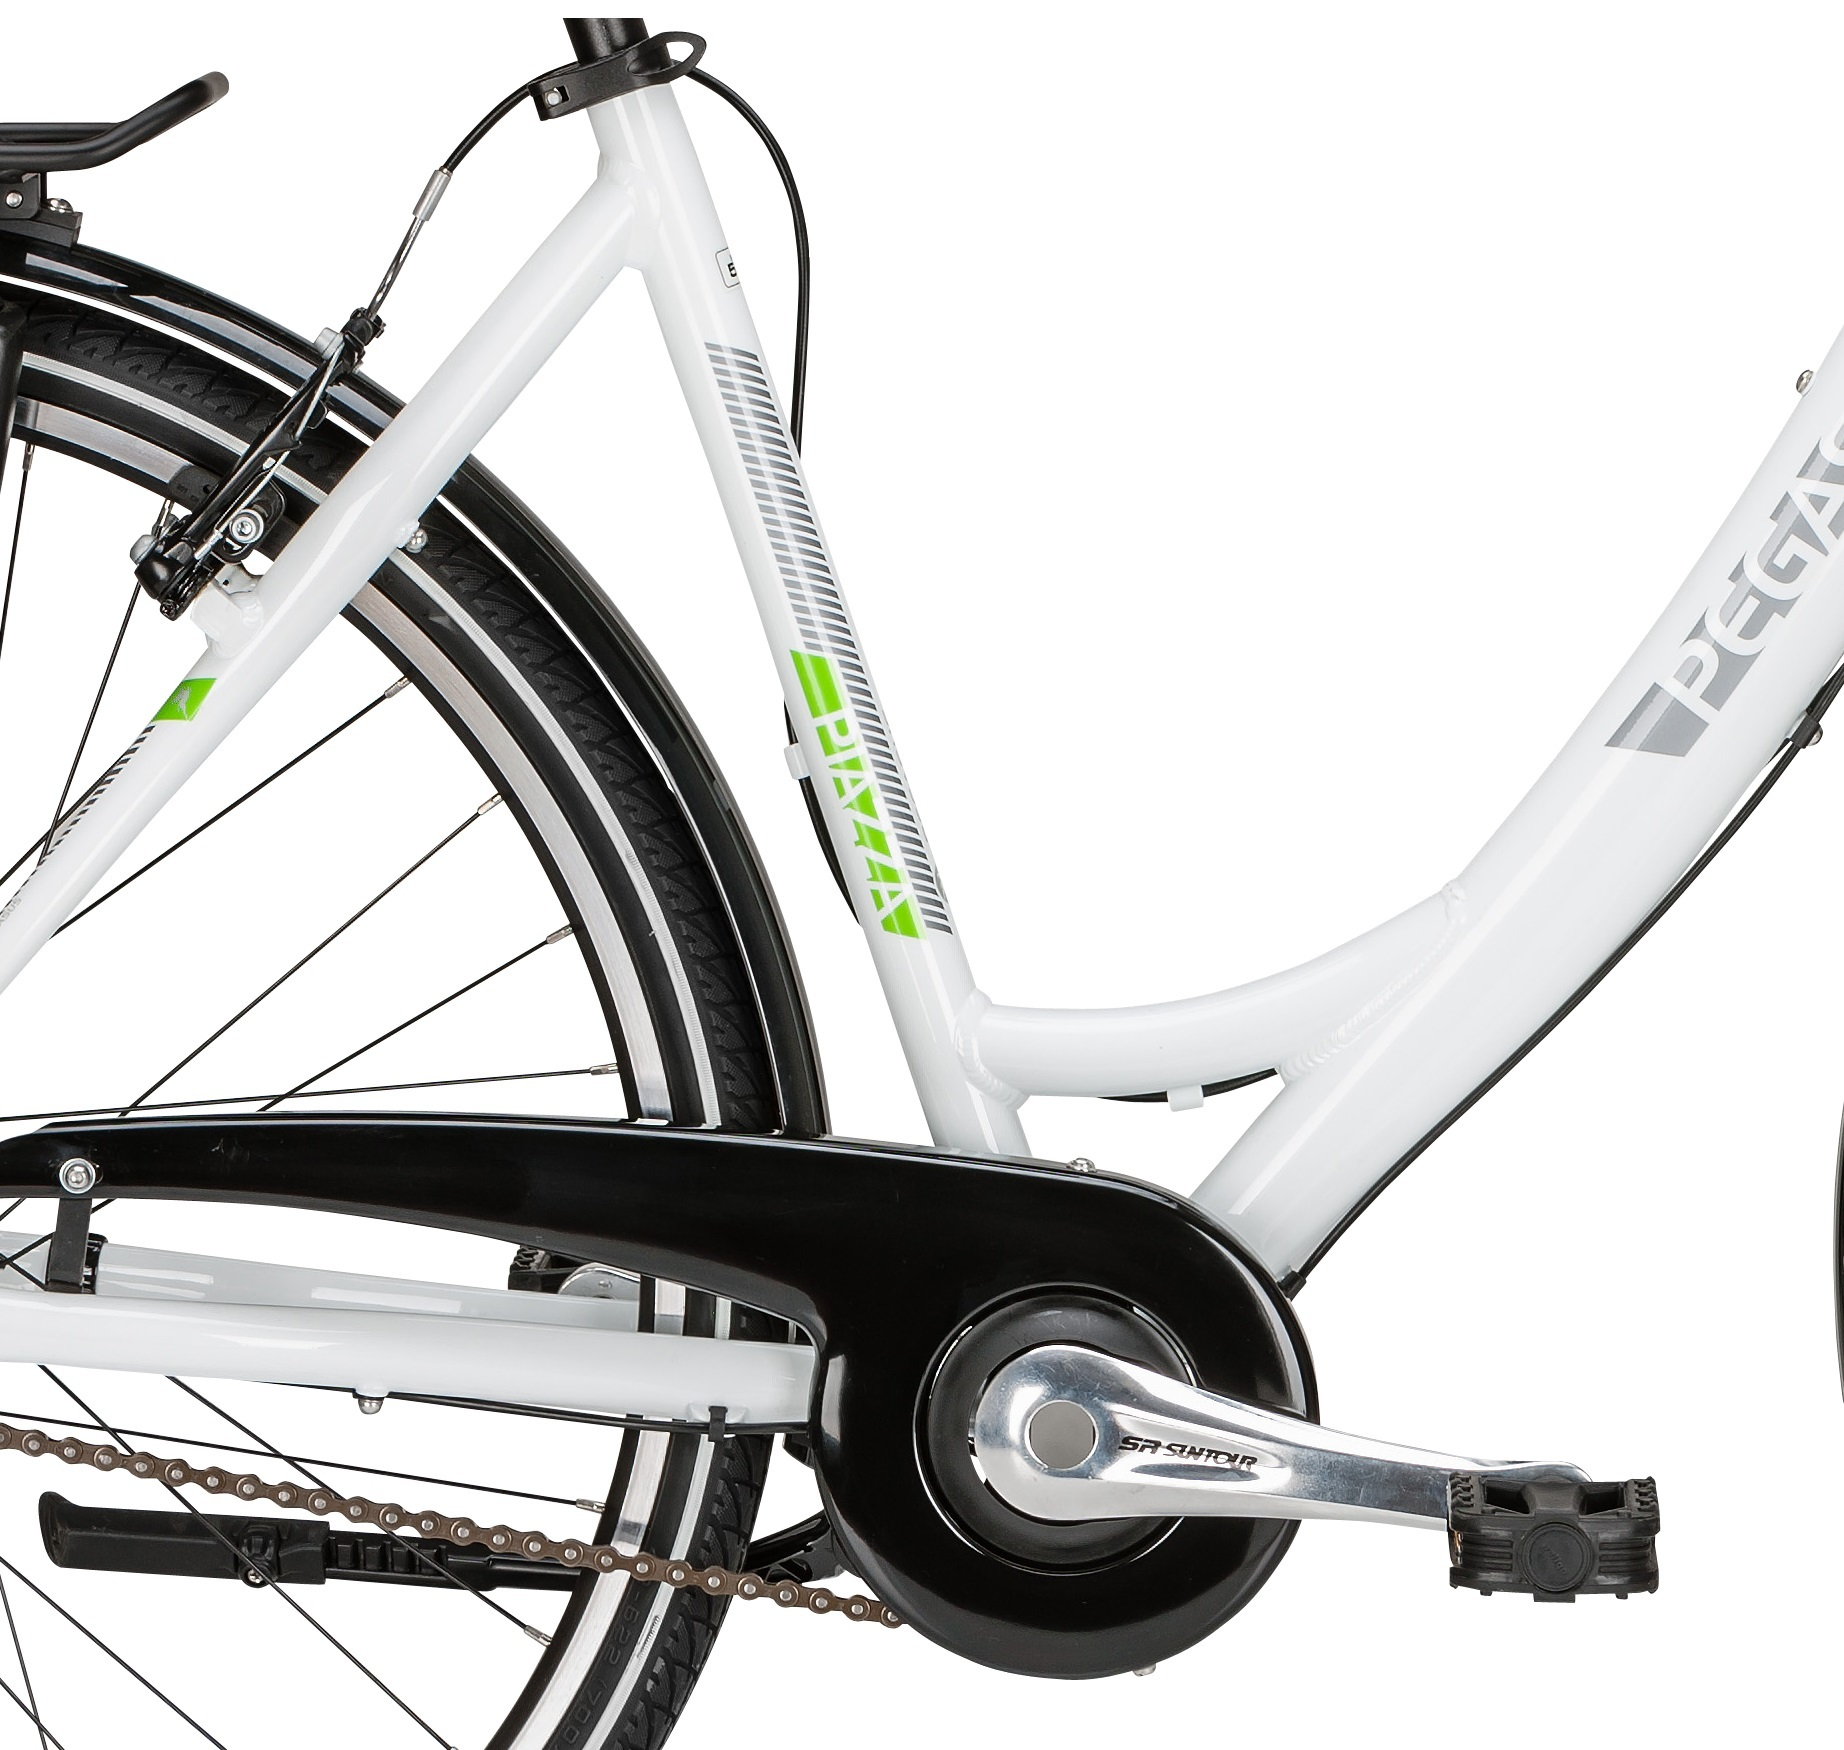 trekking fahrrad pegasus piazza 28 zoll wei shimano 7 g. Black Bedroom Furniture Sets. Home Design Ideas